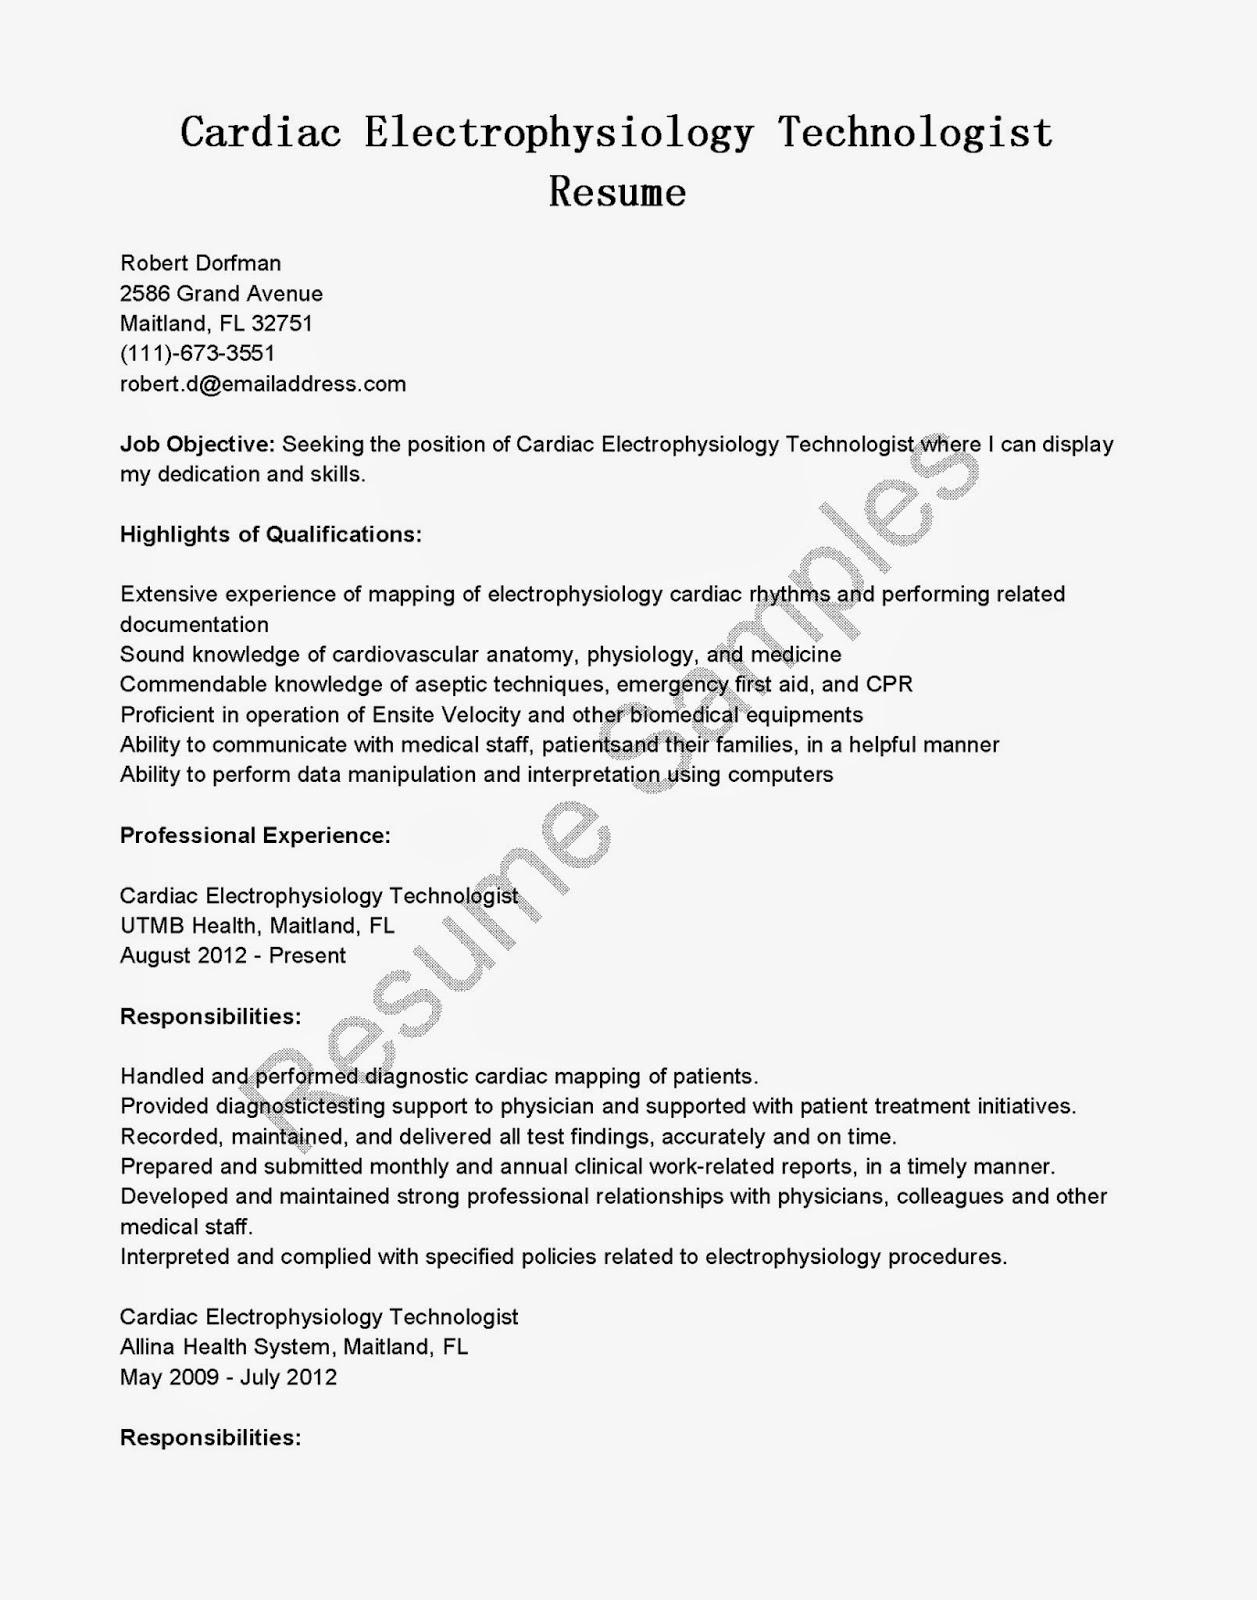 resume samples cardiac electrophysiology - Ultrasound Resume